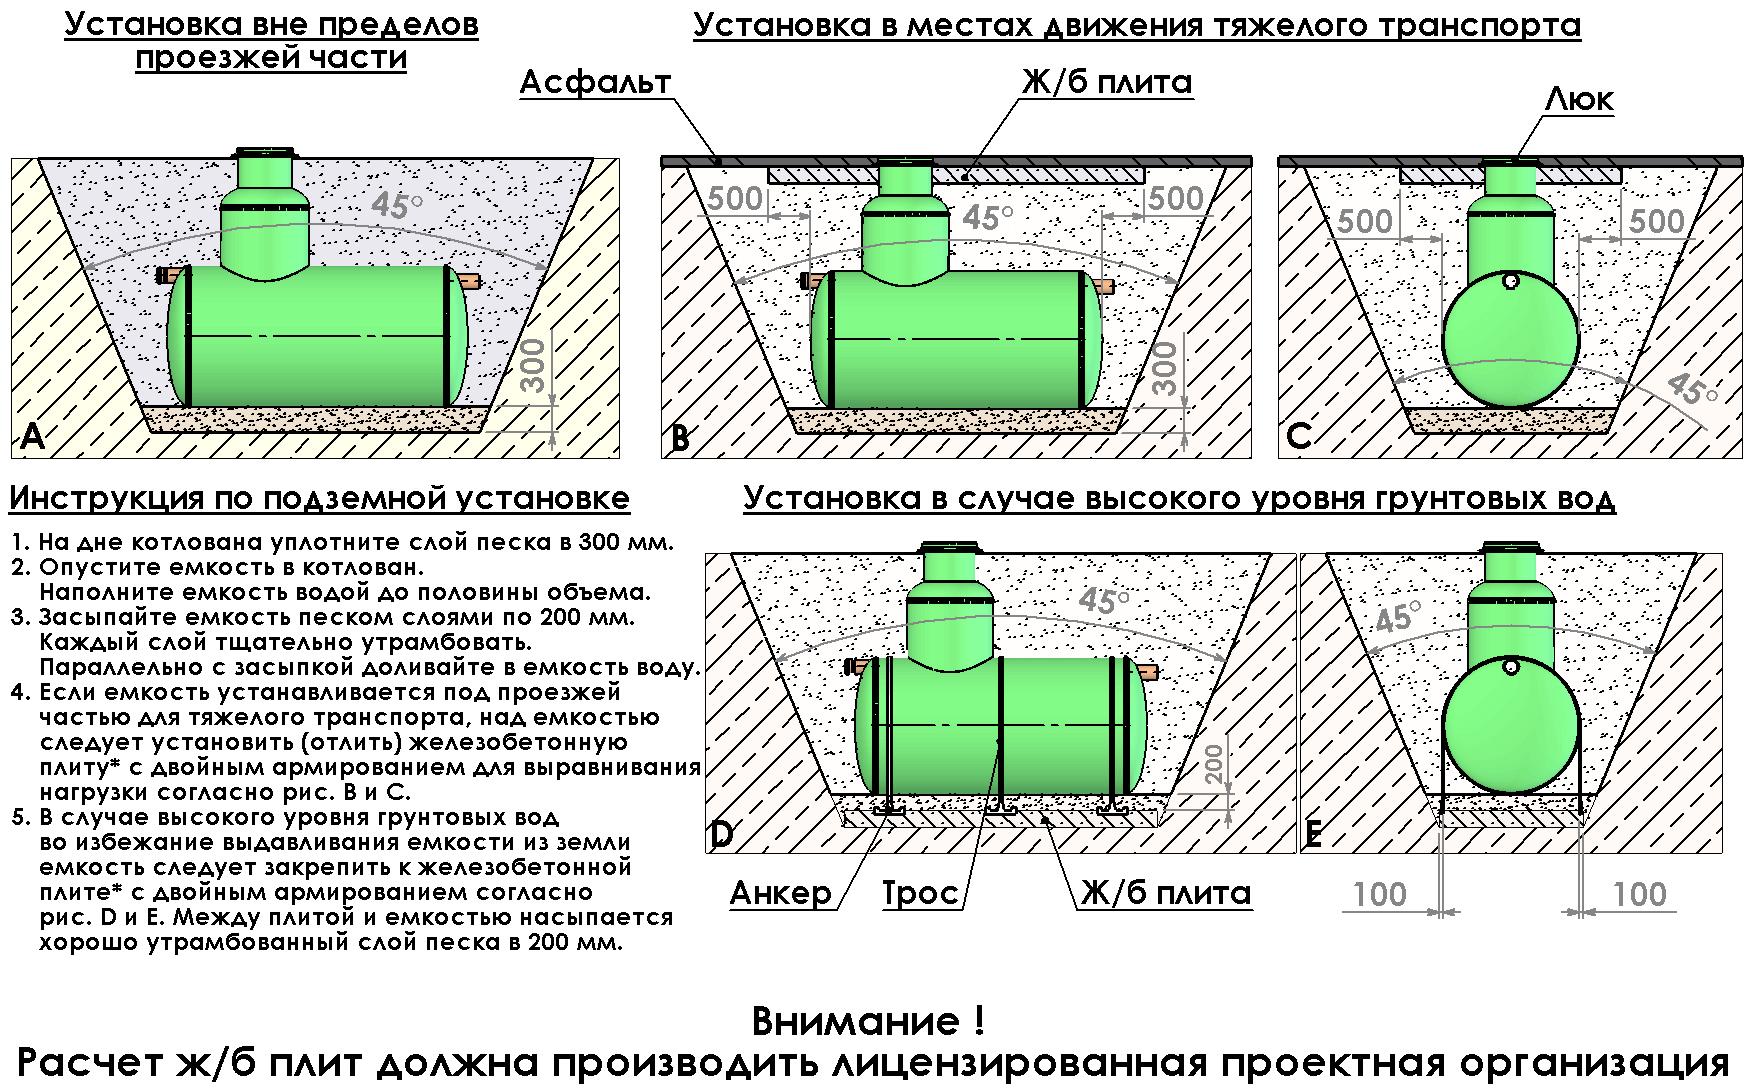 rezervuary i emkosti stekloplastik 11 Резервуары и емкости (стеклопластик)